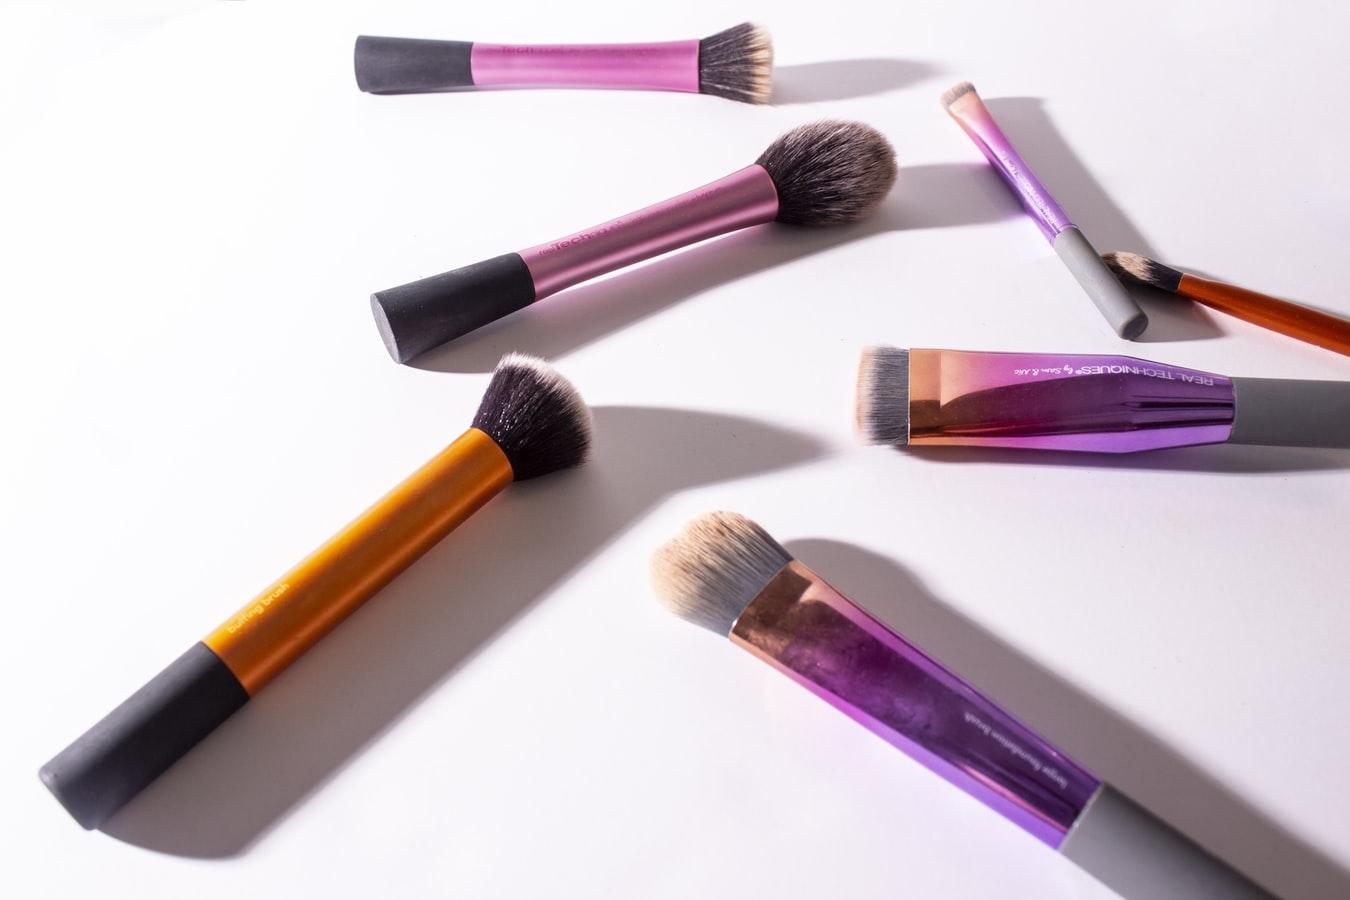 Assorted-color makeup brushes on white surface. (Photo via Unsplash,com/GlowRepose)